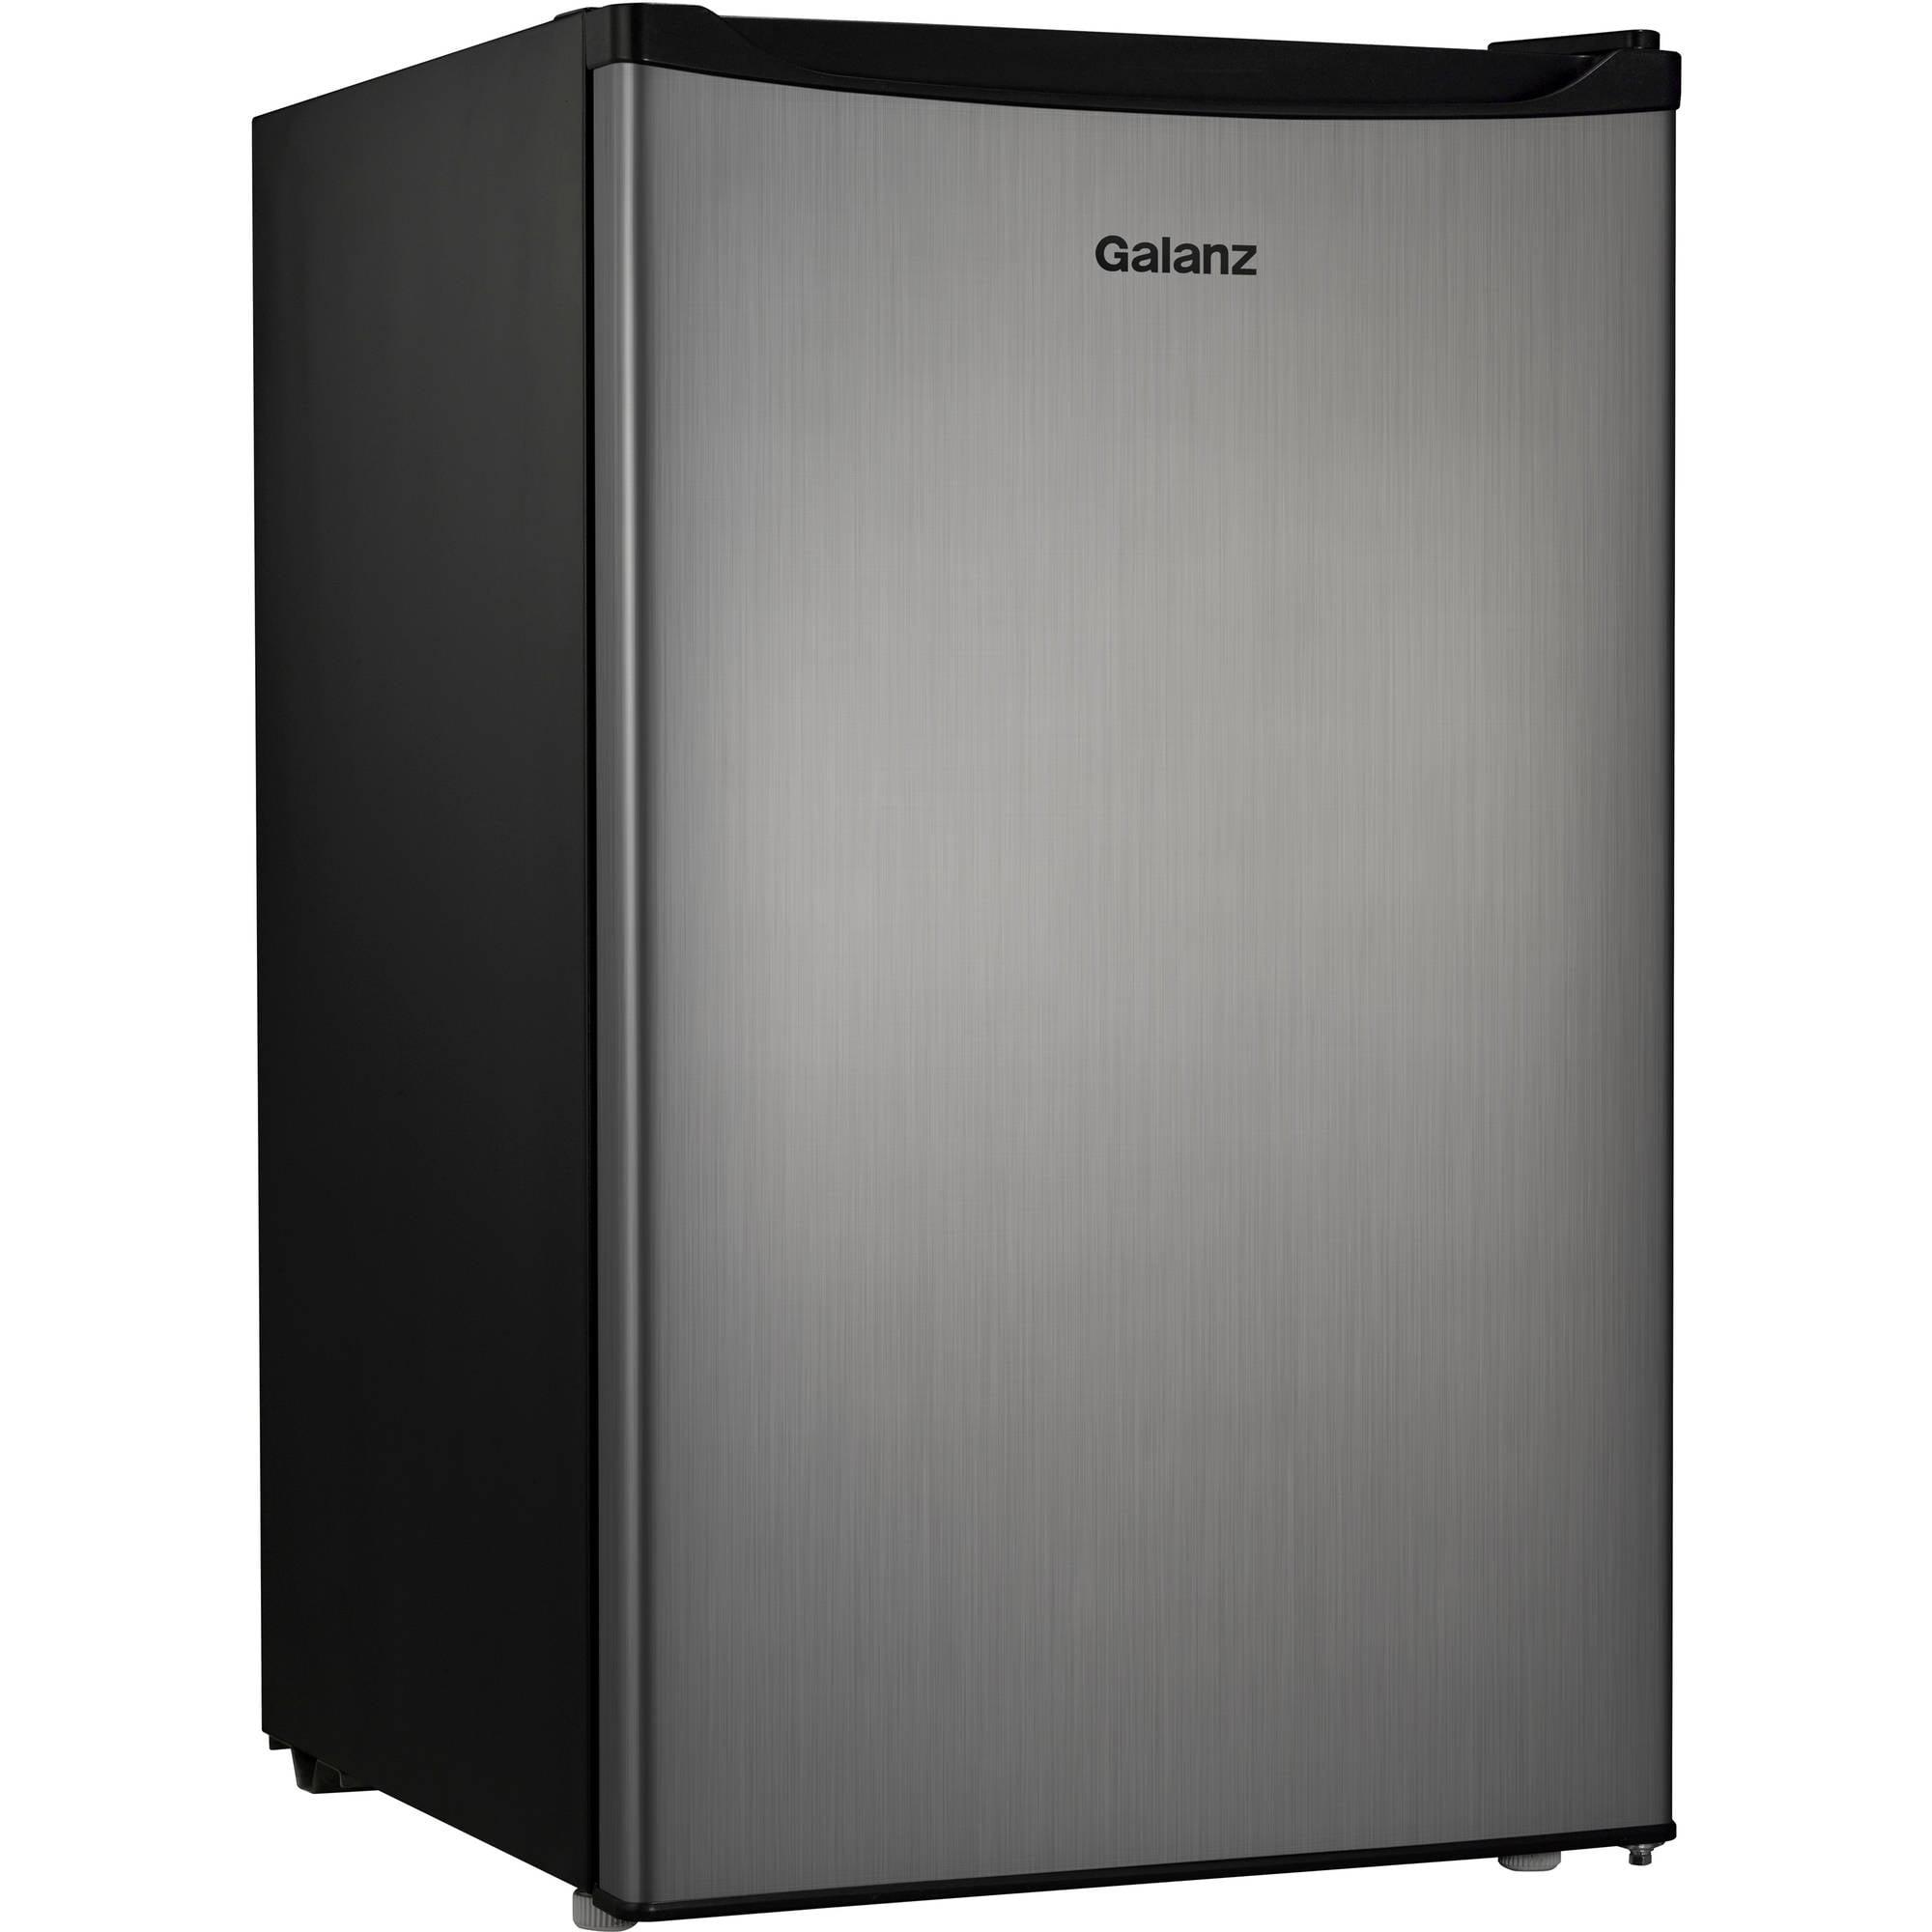 Galanz 4.3 Cu Ft Single Door Compact Refrigerator GL43S5, Stainless Steel Look